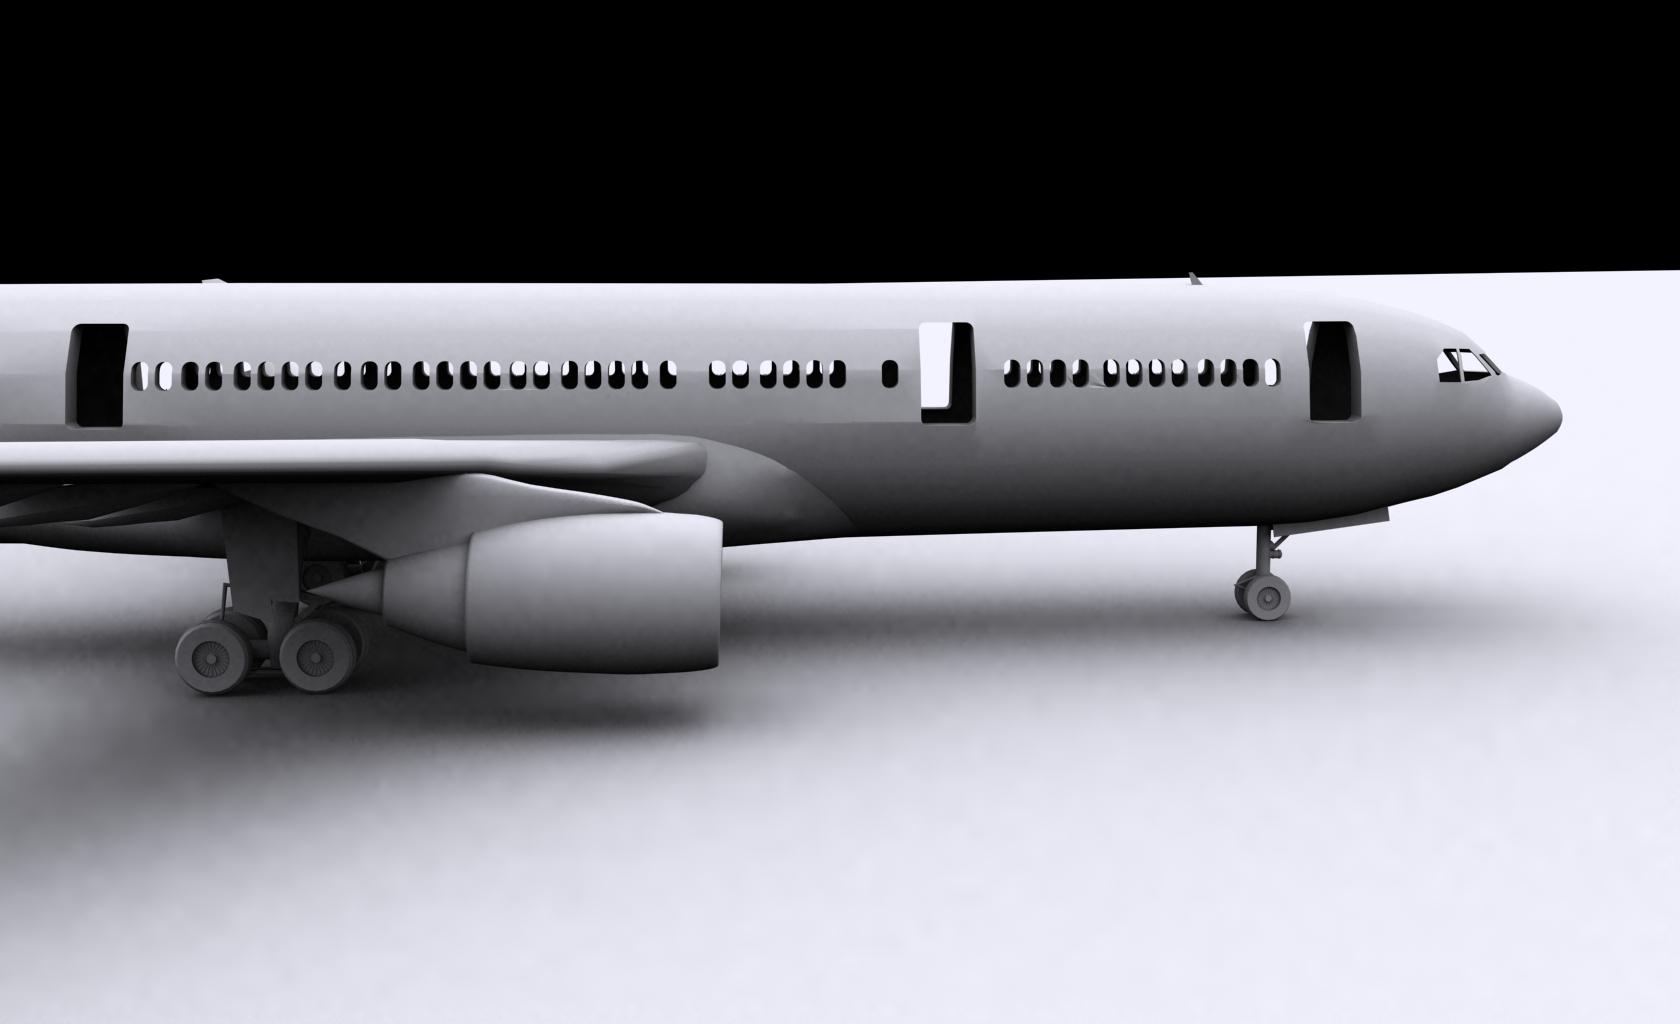 airbus a330-200 3d model ige igs iges  obj 152721